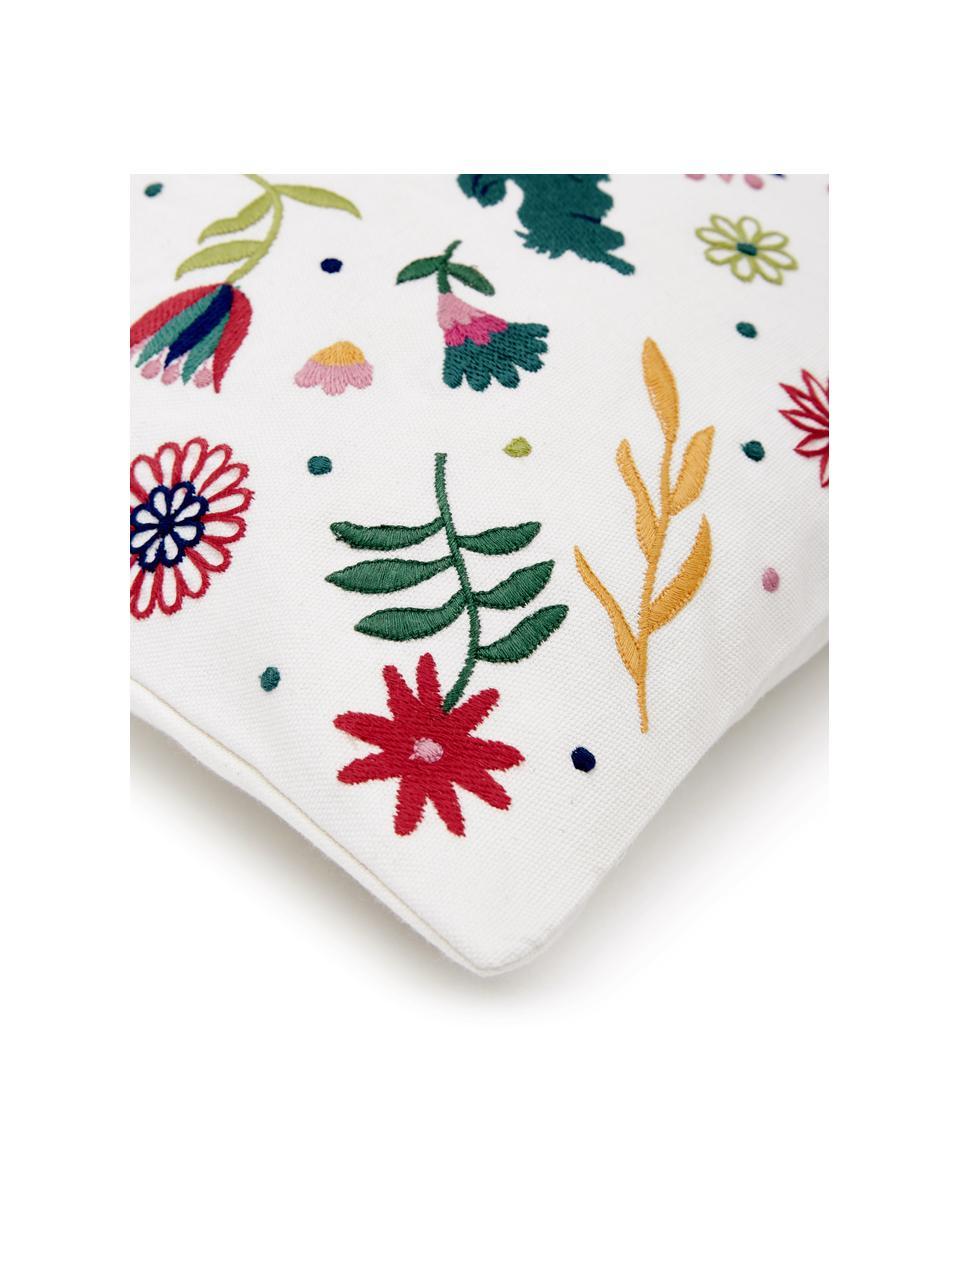 Bestickte Kissenhülle Folka mit buntem Muster, 100% Baumwolle, Mehrfarbig, 45 x 45 cm